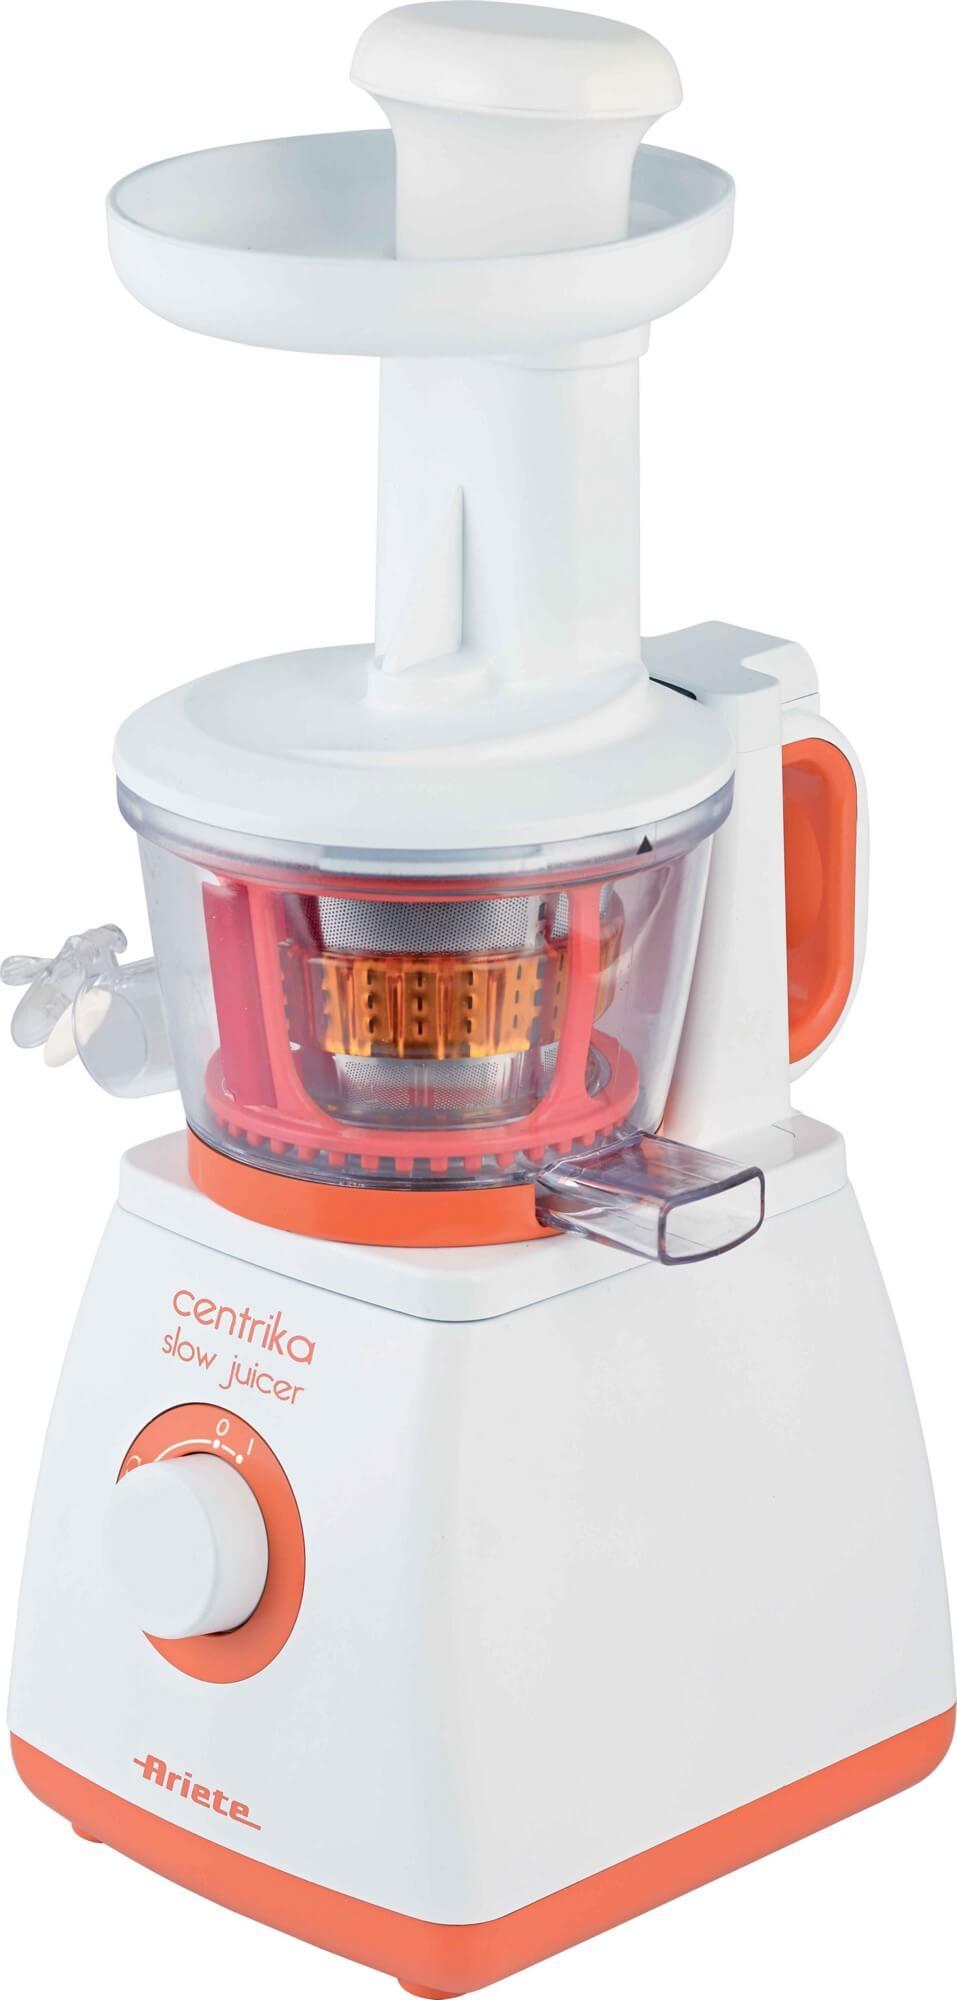 Girmi Slow Juicer Istruzioni : Centrika Slow Juicer - Ariete Store